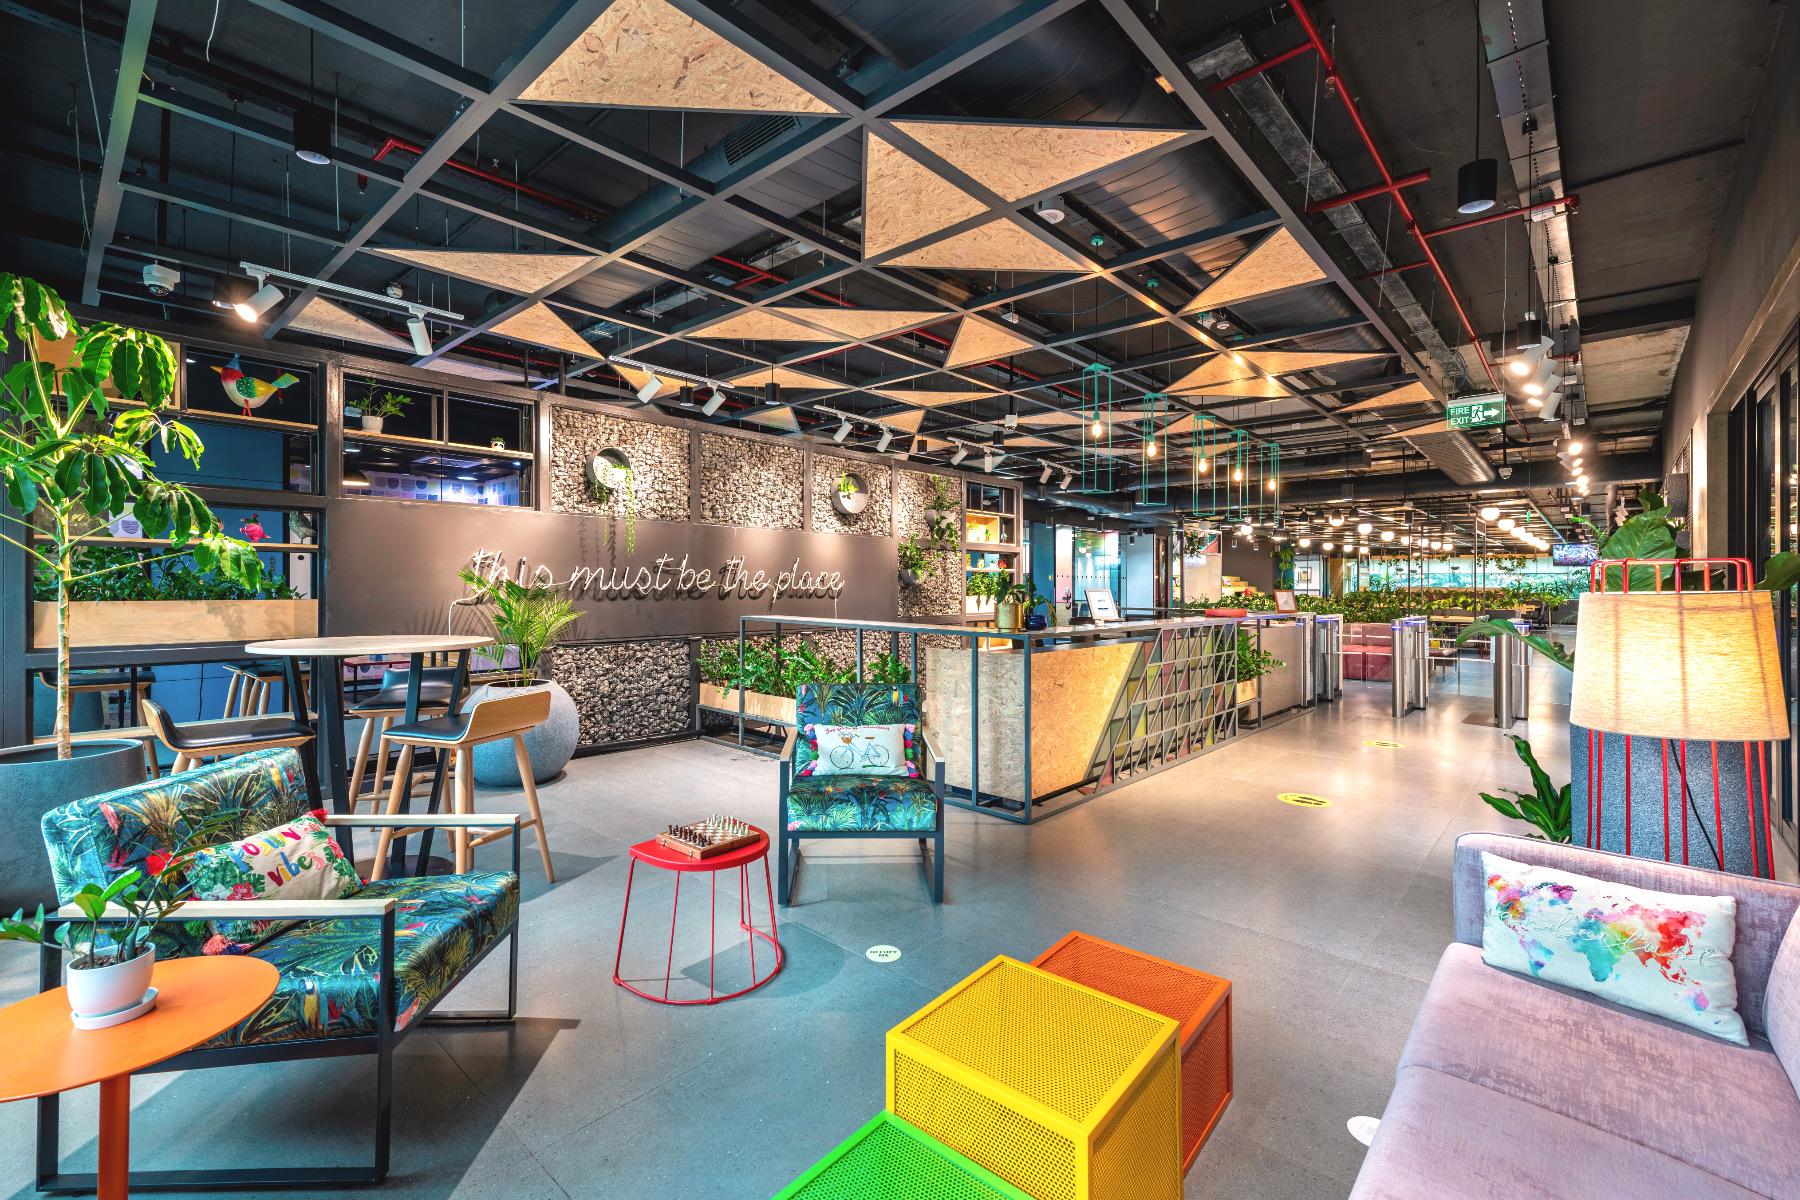 A Look Inside 2gethr's Coworking Space in Bengaluru